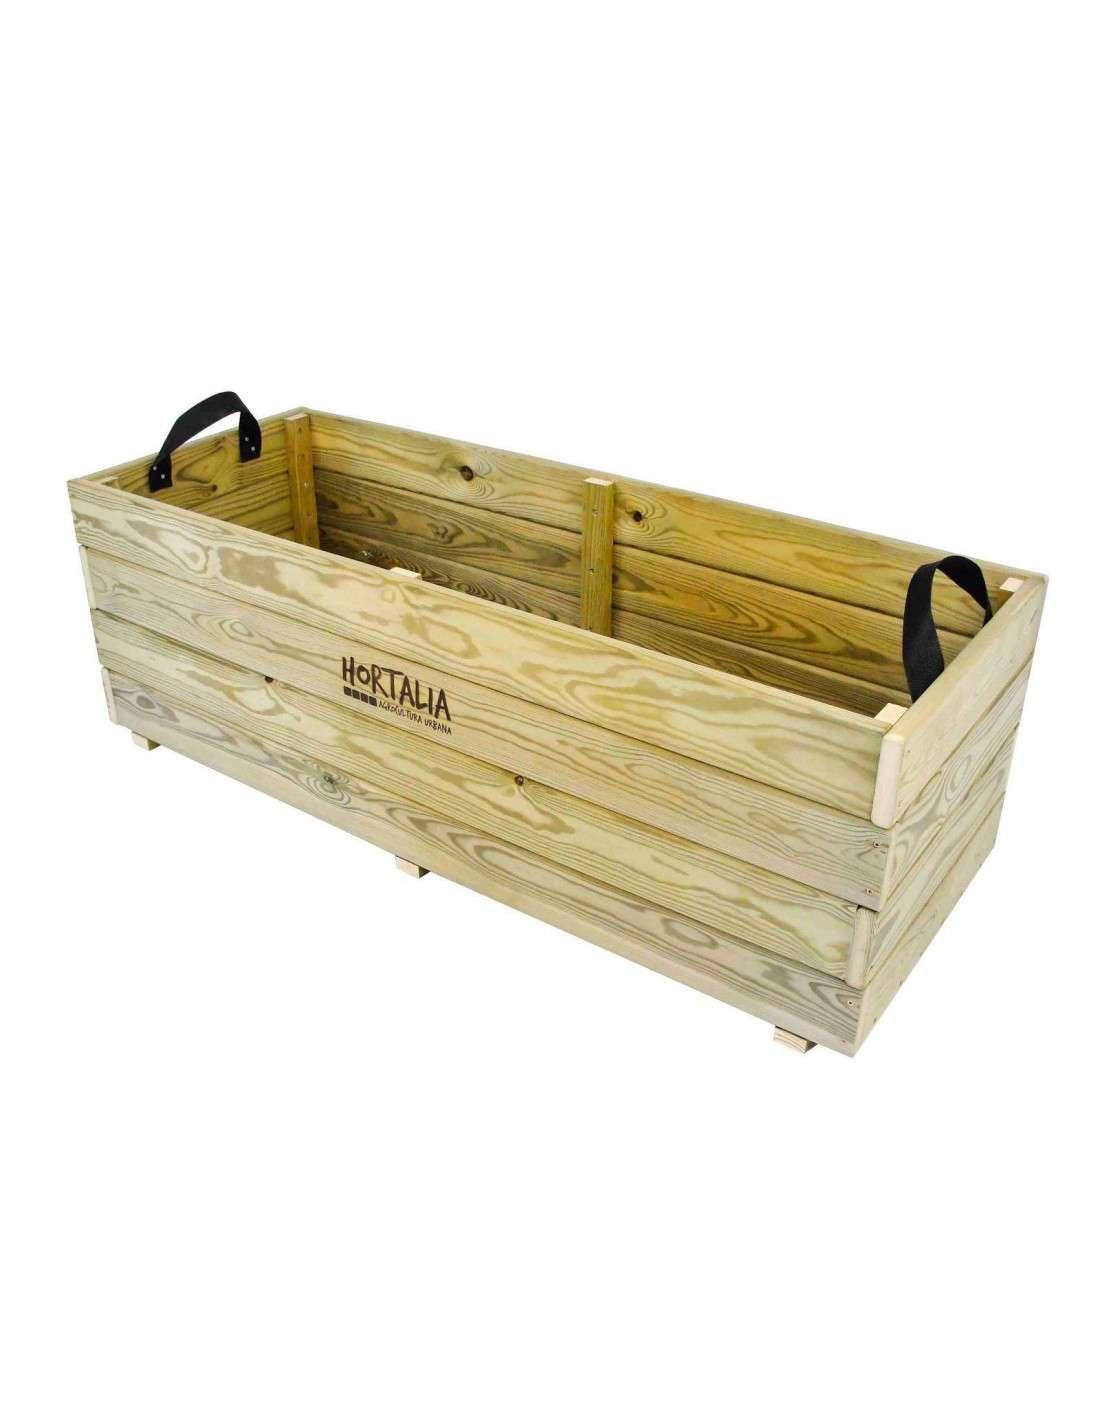 Jardinera de madera 120x45x40cm hortalia cocopot huerto urbano - Jardinera de madera ...